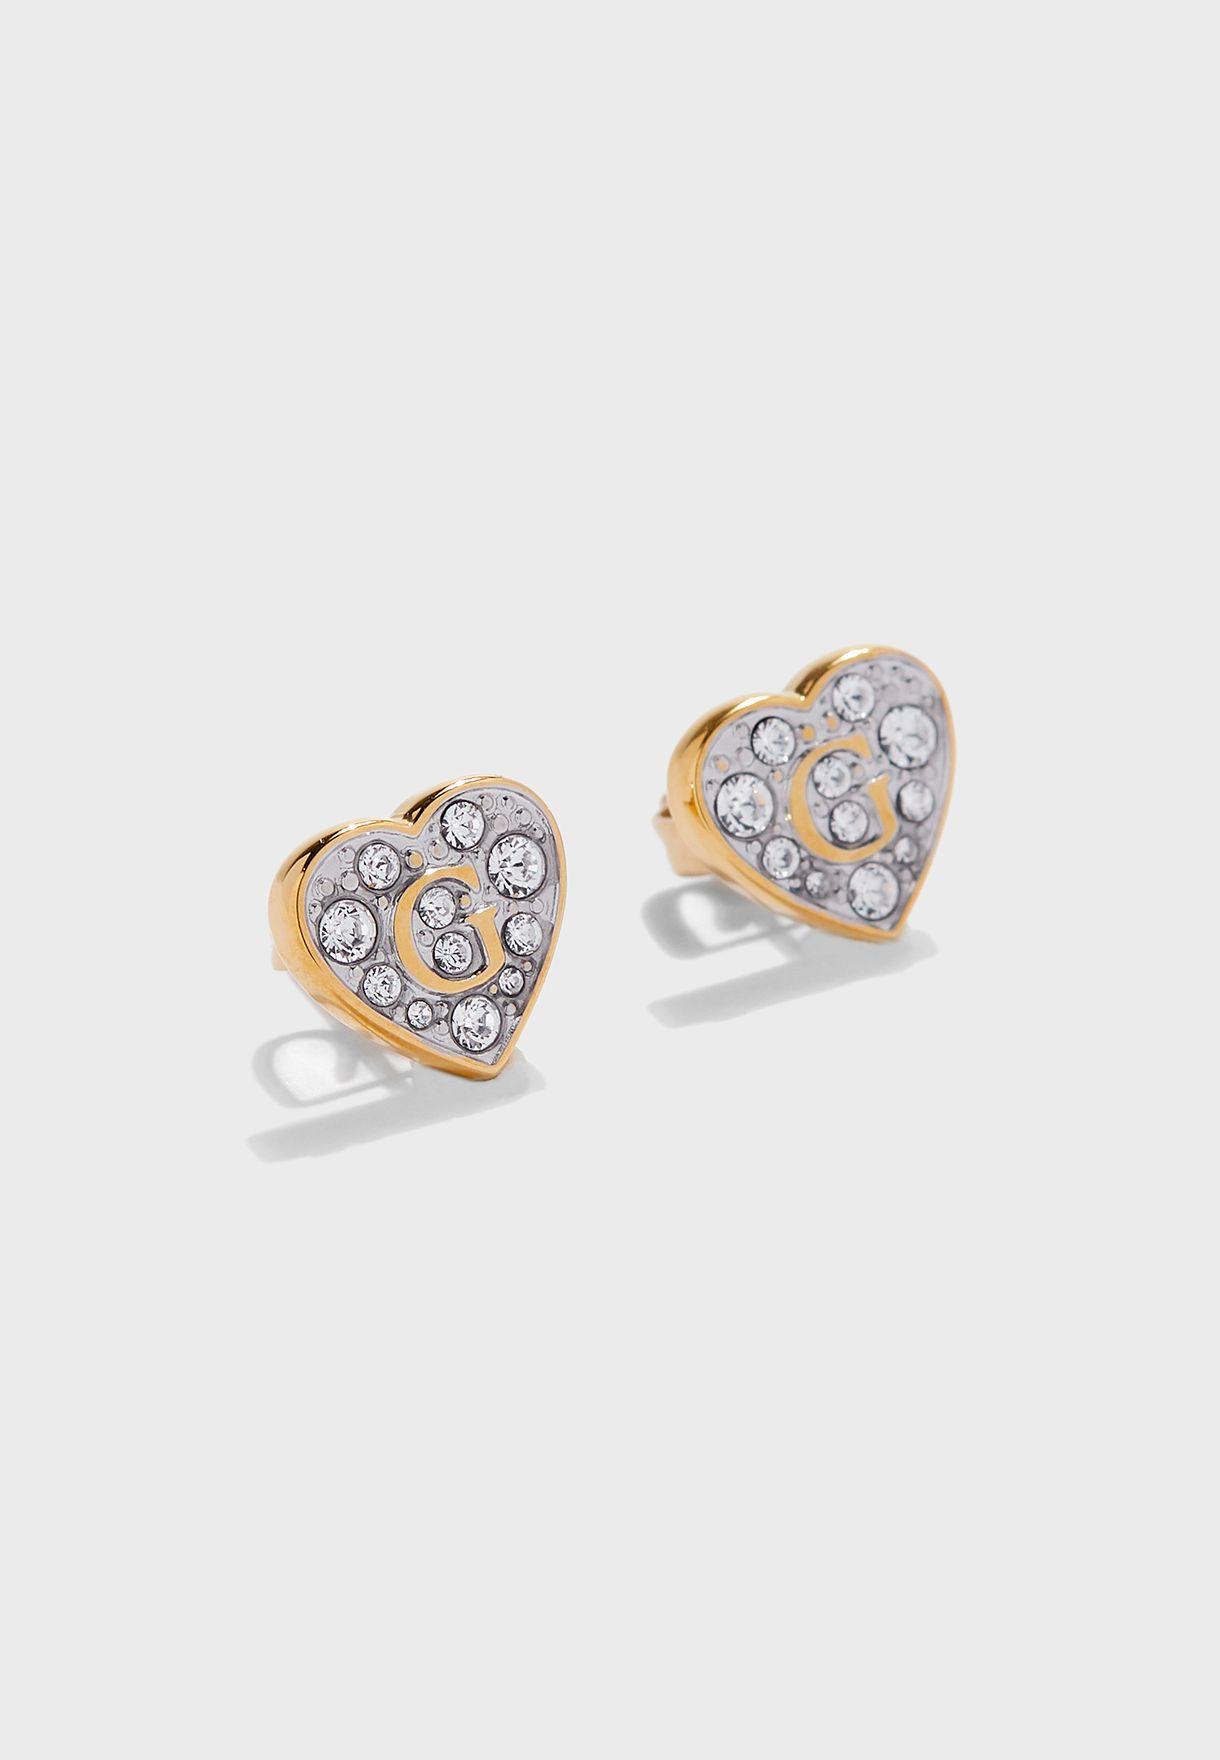 Pave Heart Stud Earrings